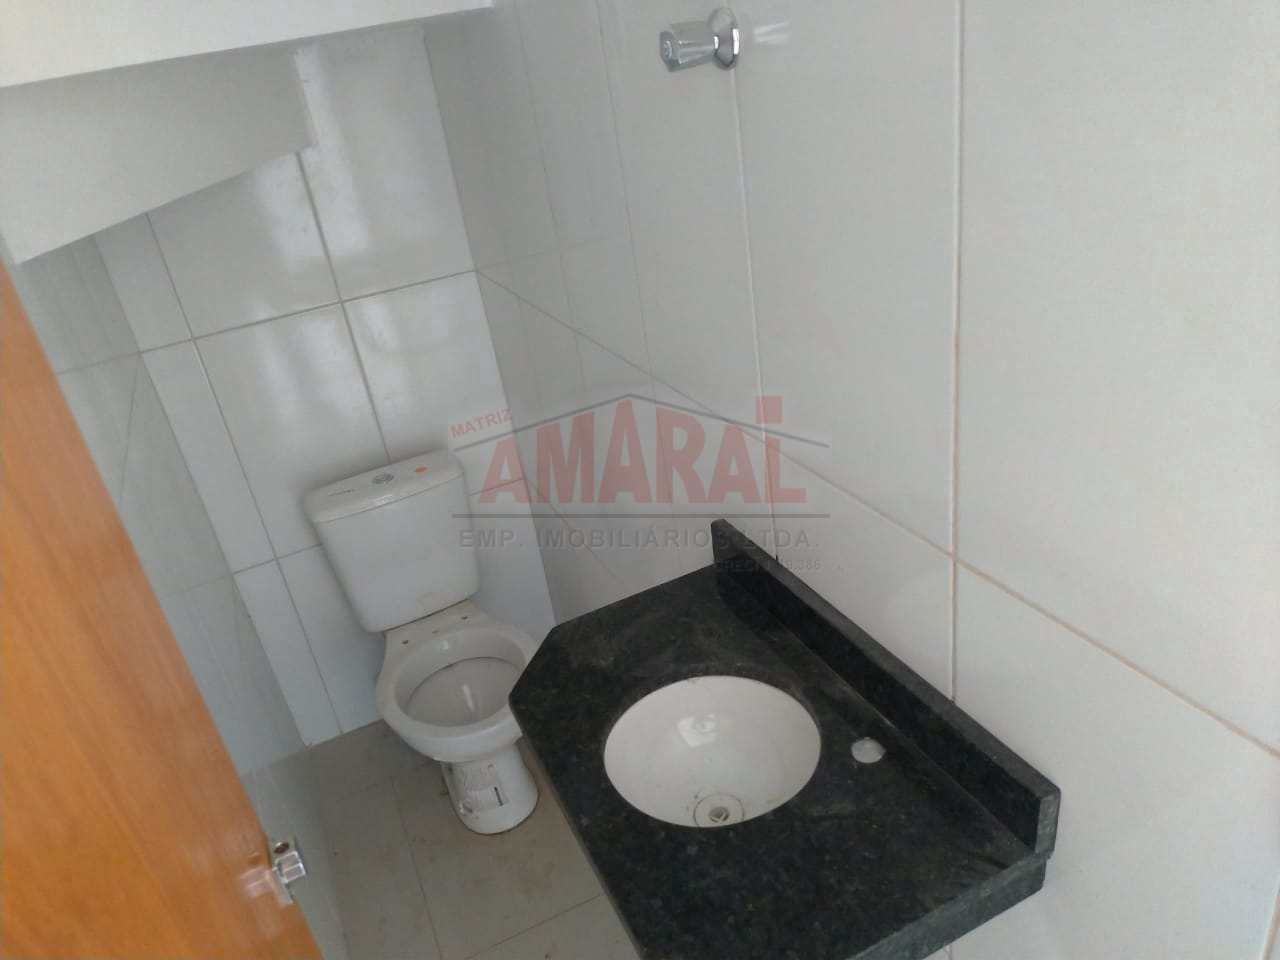 Sobrado com 2 dorms, Jardim Vera Cruz(Zona Leste), São Paulo - R$ 295 mil, Cod: 11247